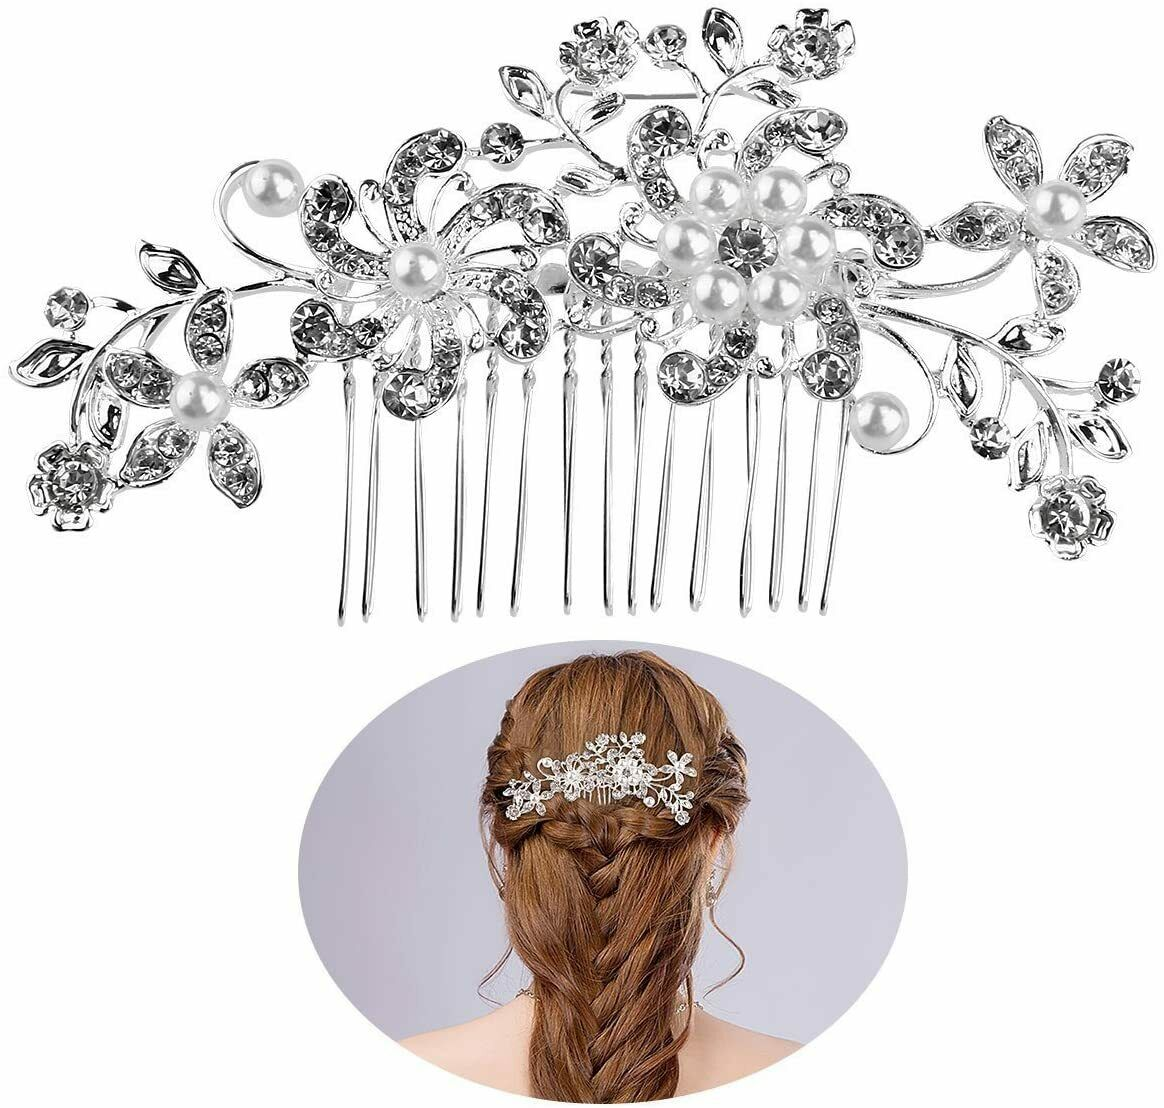 Bridal Bridesmaid Flower Wedding Crystal Hair Clips Jewelry Hair Pins Party